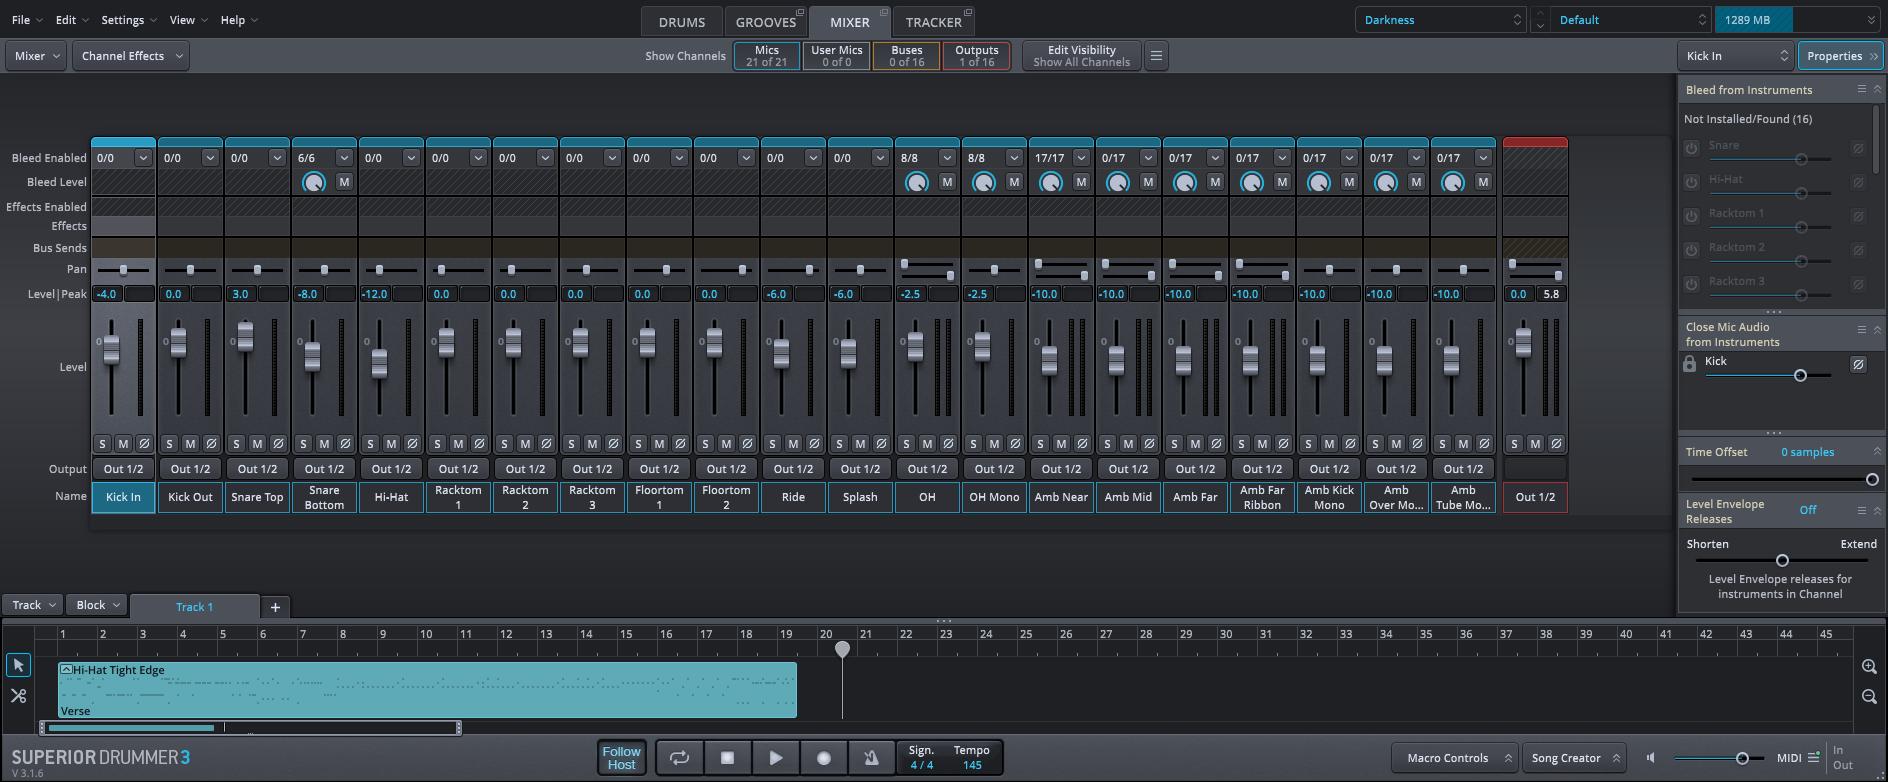 004 Mixer Darkness.png